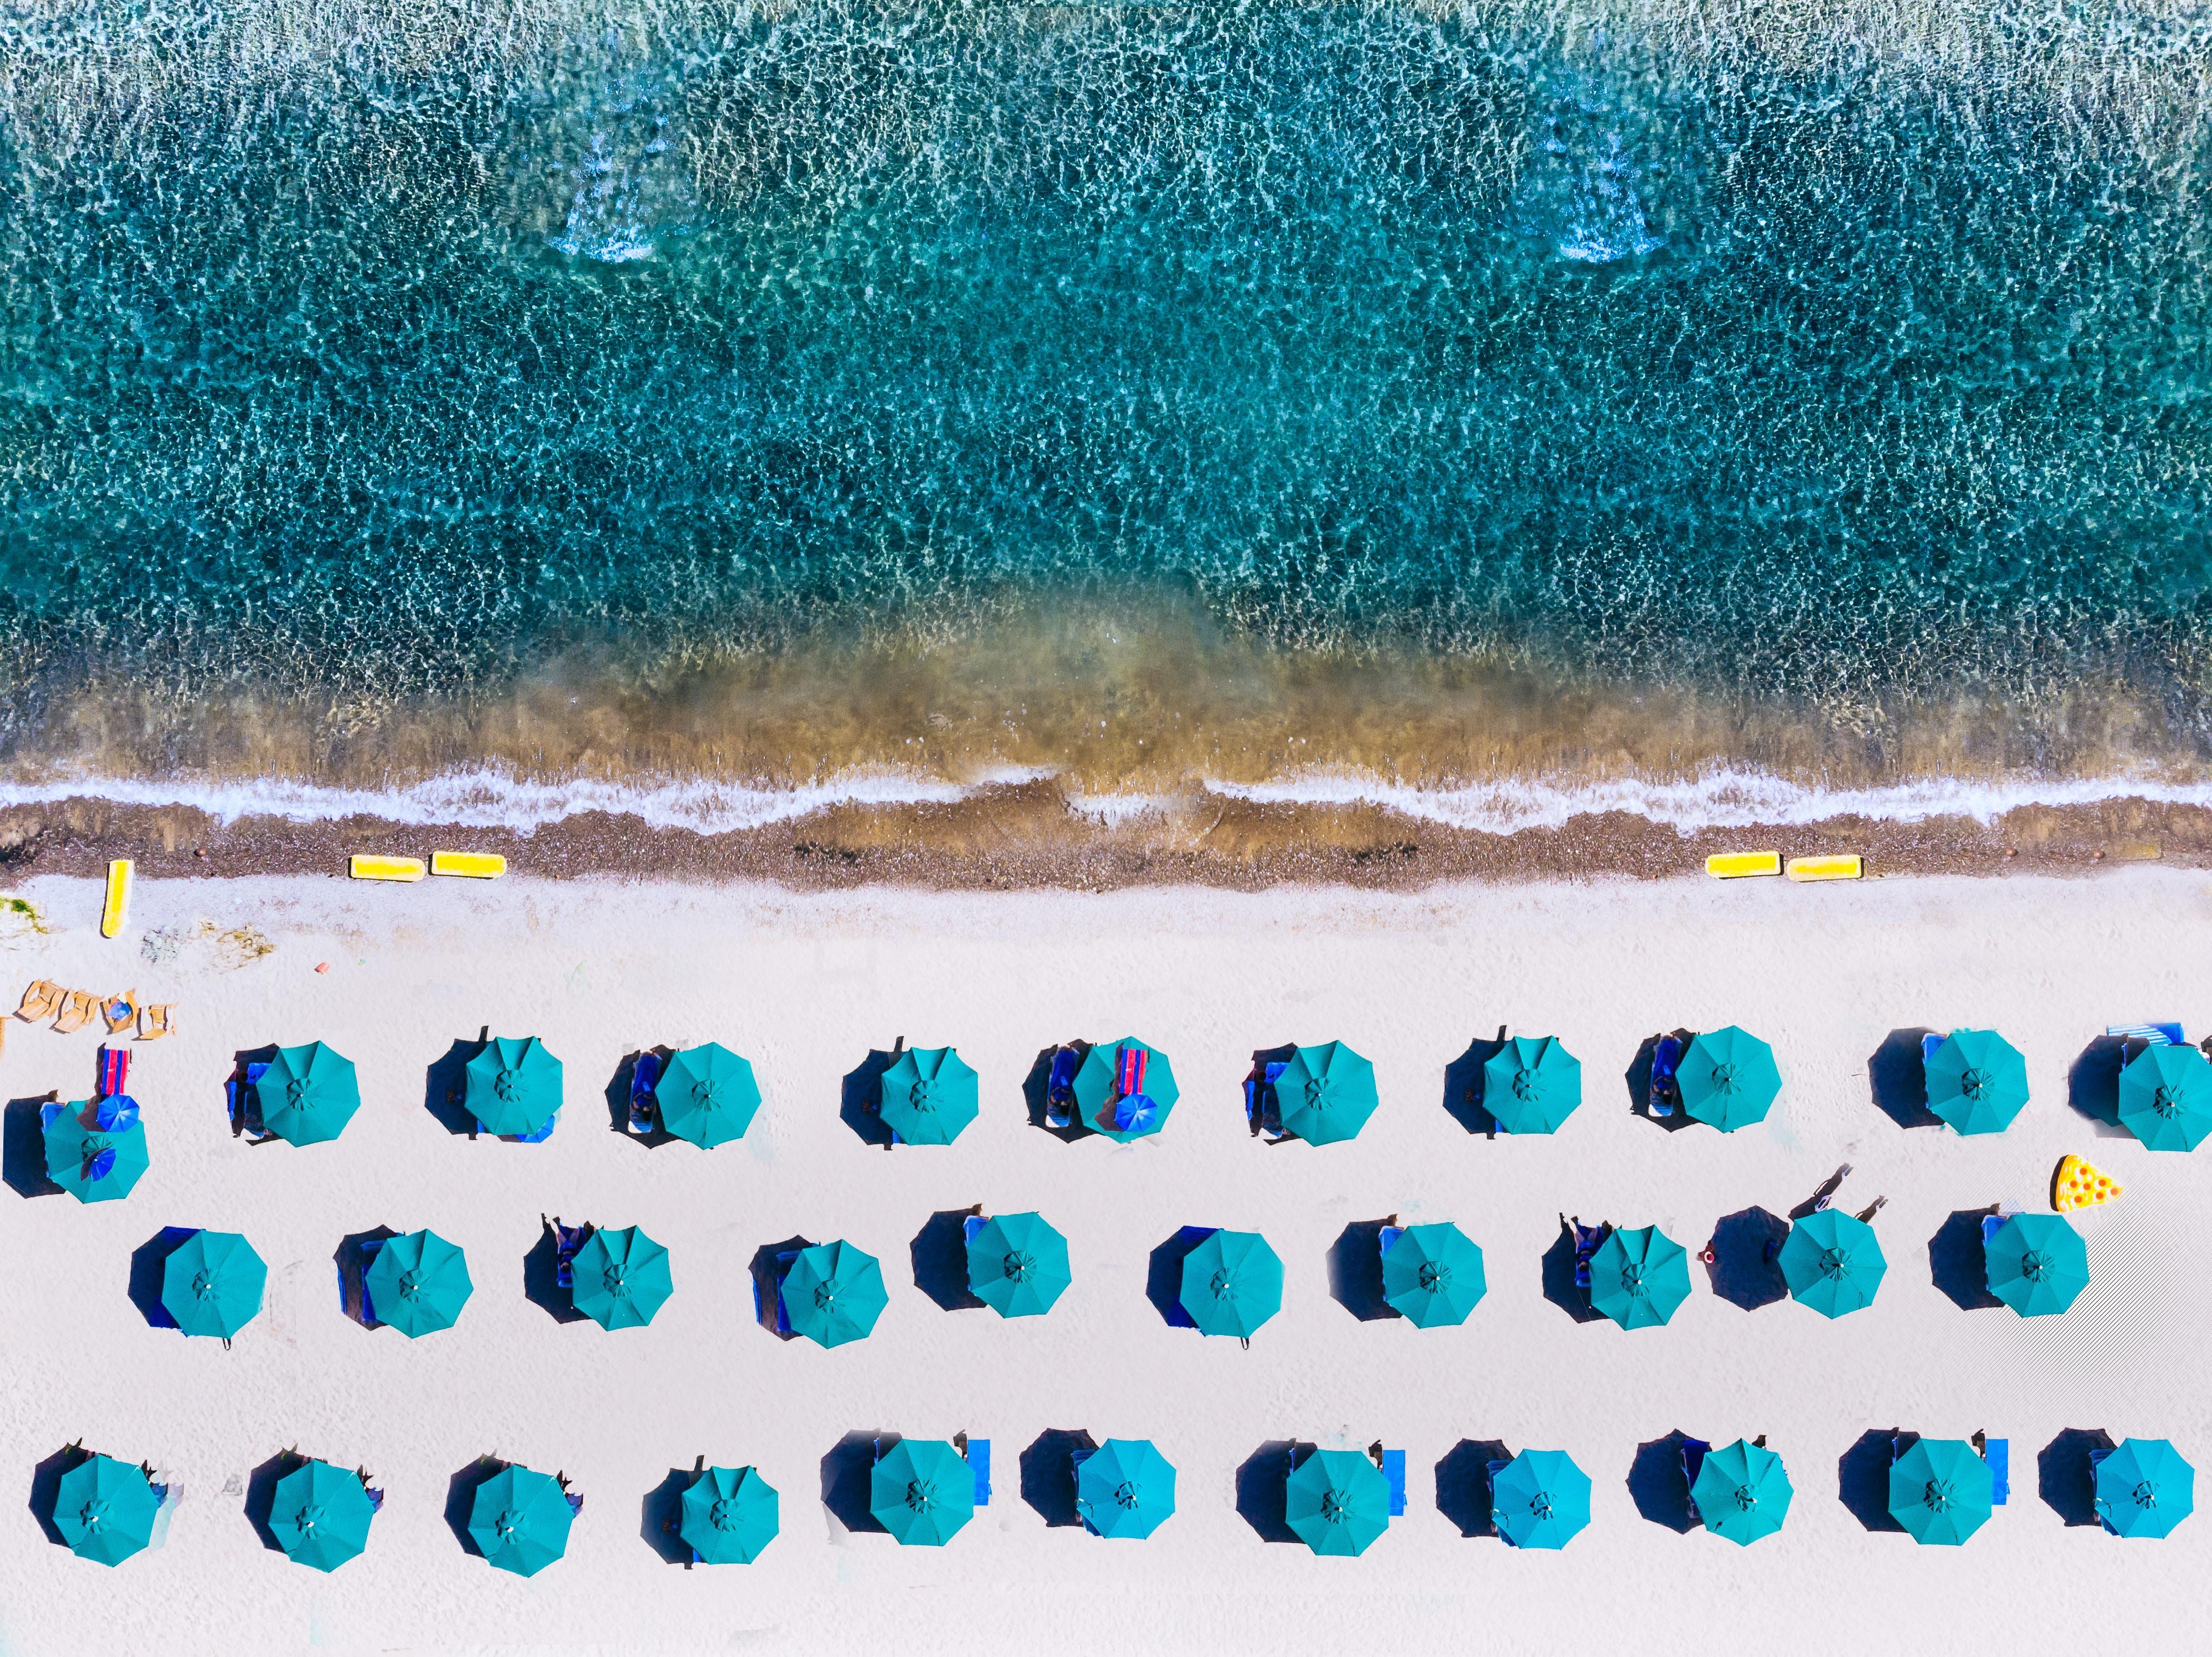 Umbrellas on Kings Beach Shoreline